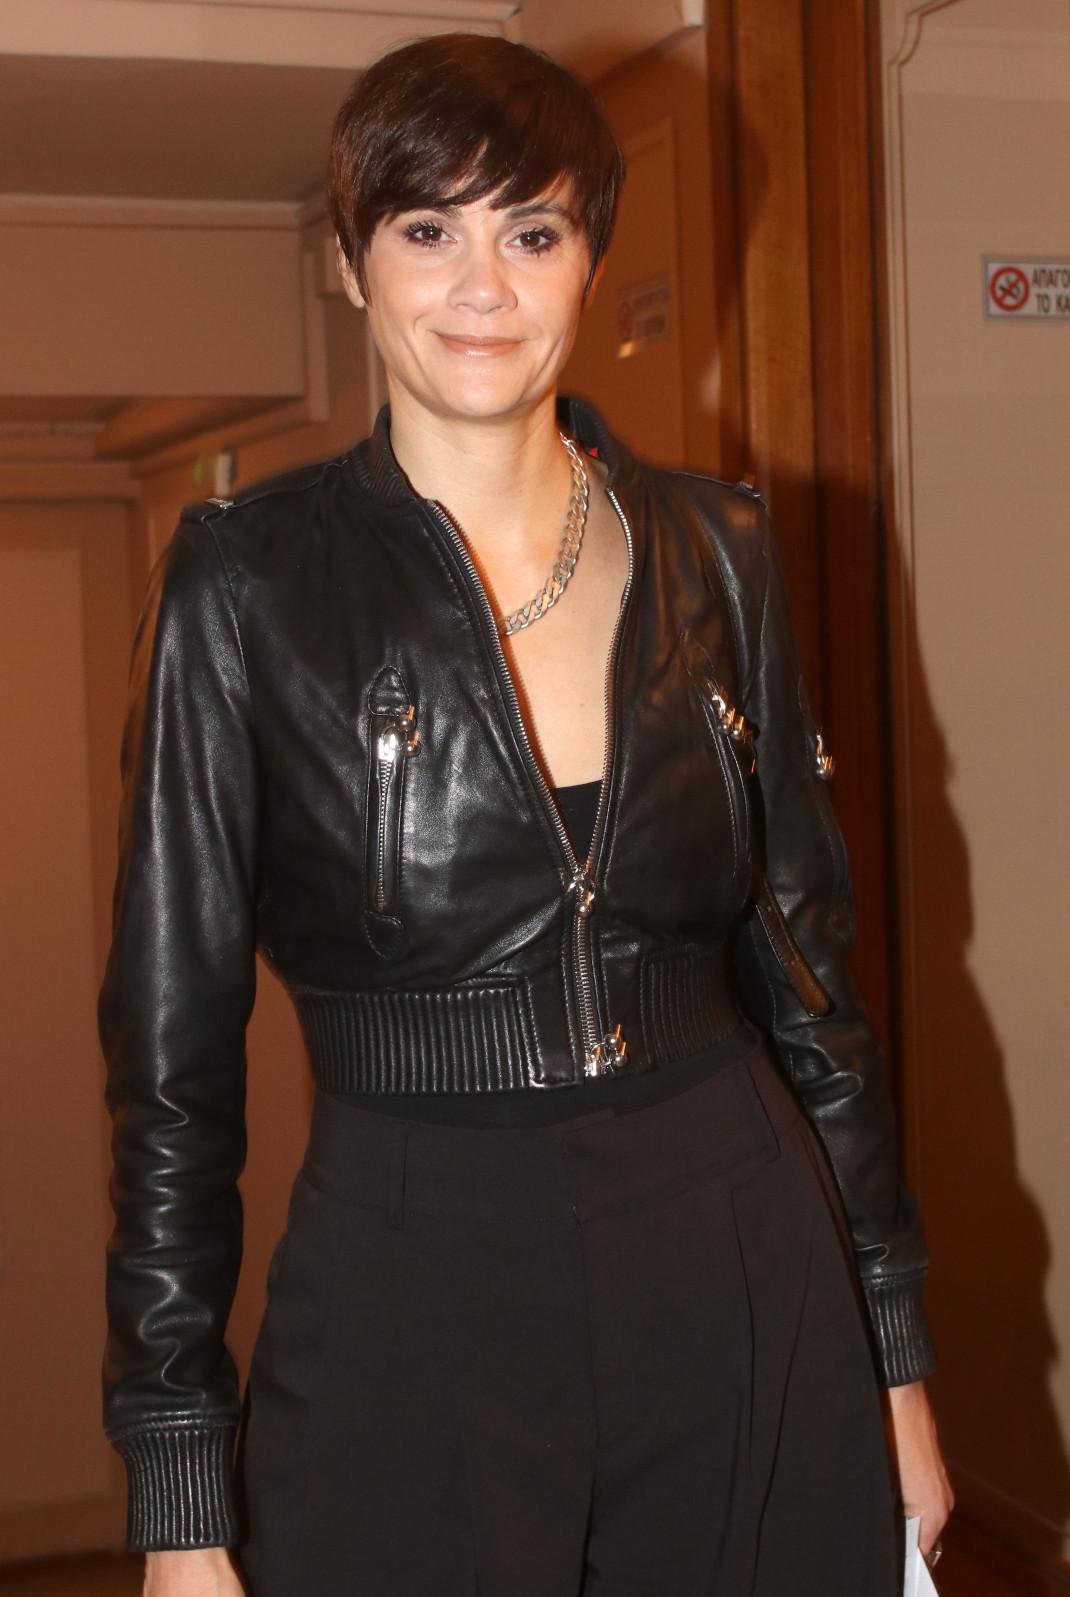 H Αννα Μαρία Παπαχαραλάμπους με κοντά μαλλιά